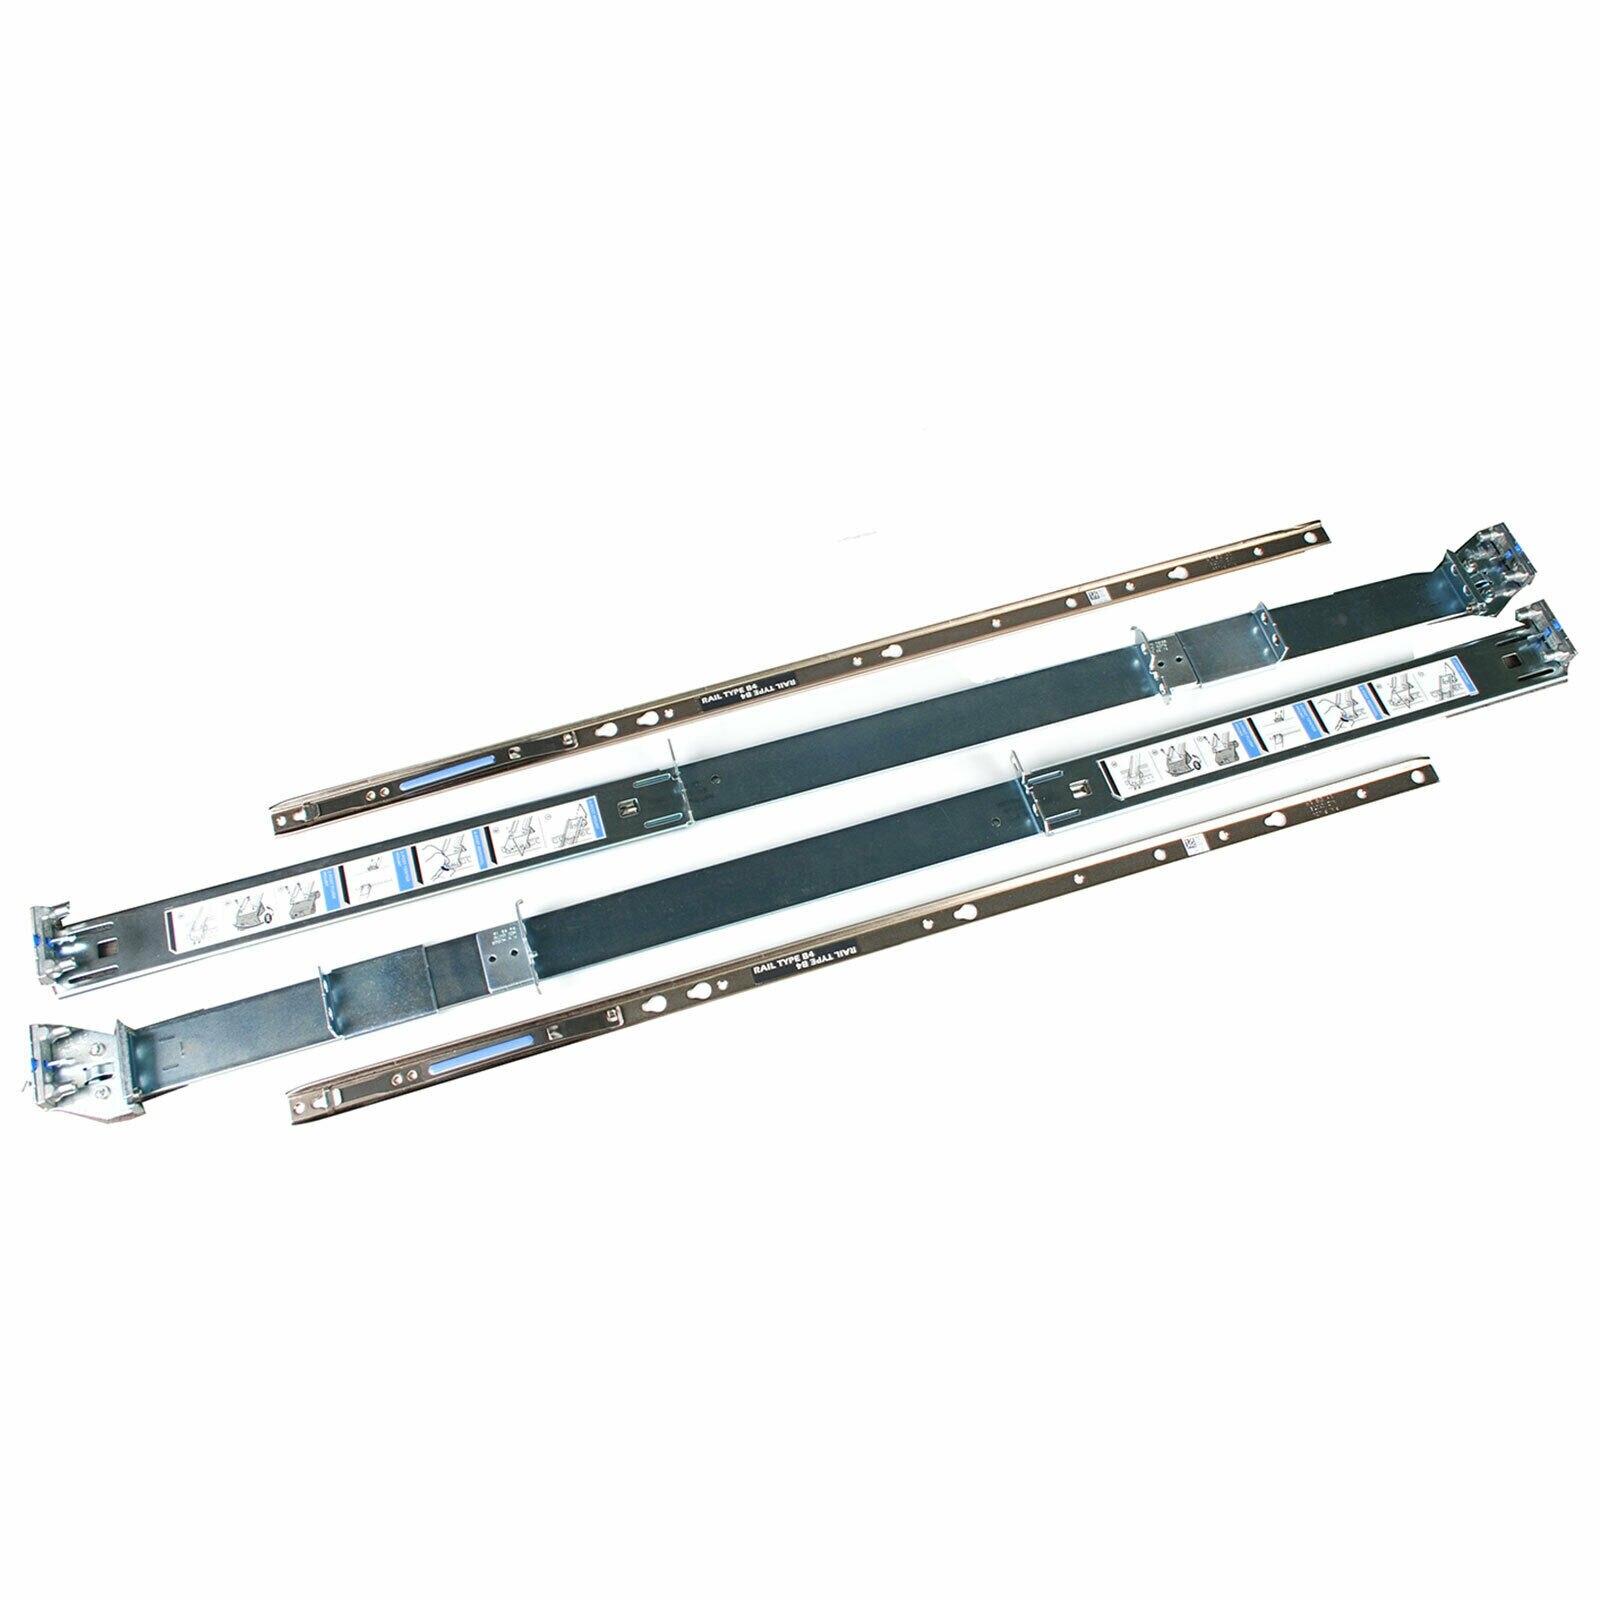 Para dell poweredge r520 r720 r730 r820 servidor 2u pronto trilho fino estático readyrails kit ferroviário